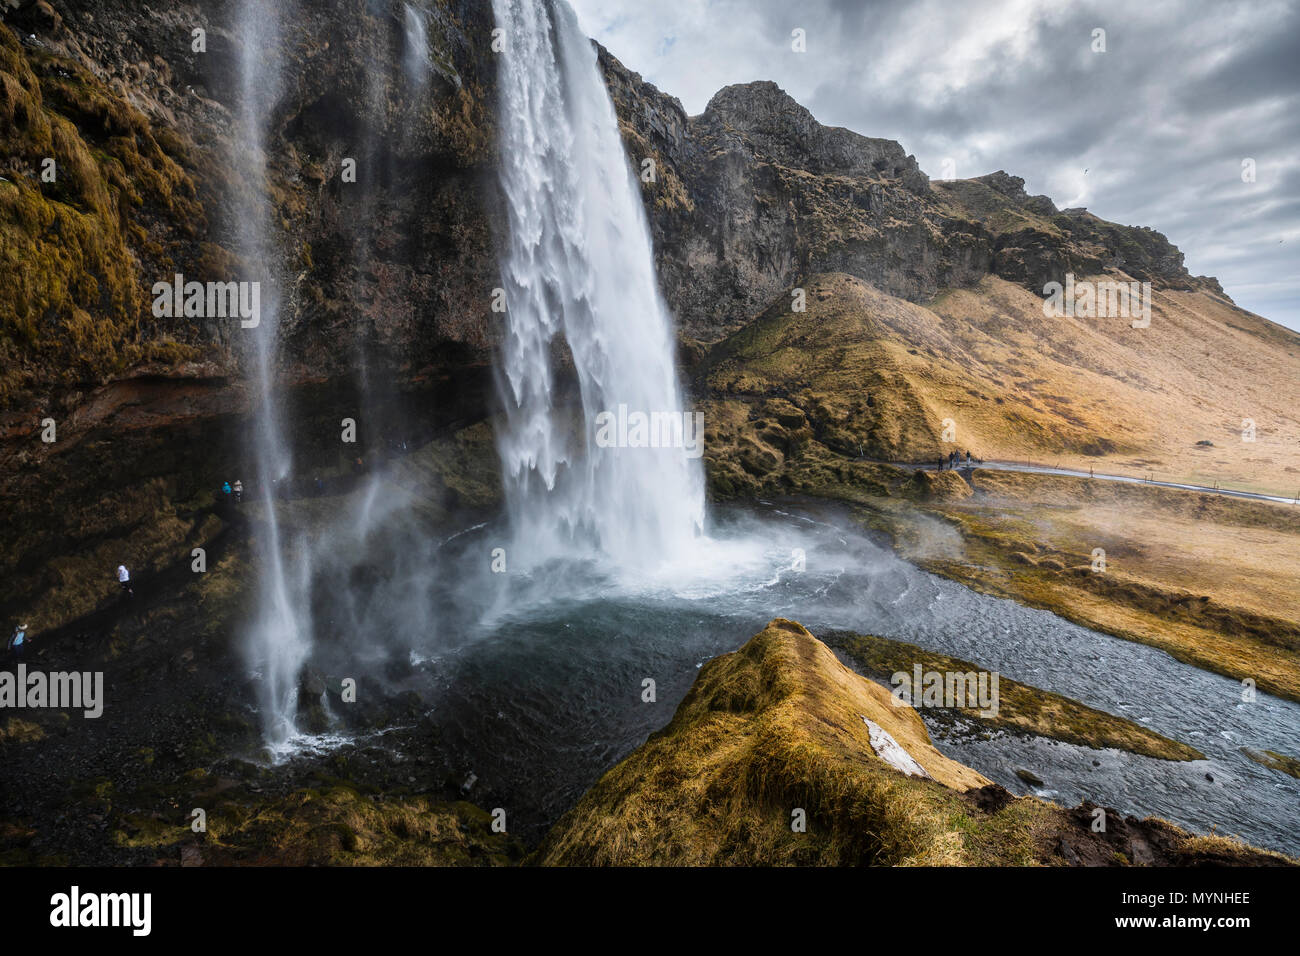 Cascade de Seljalandsfoss, Islande Banque D'Images